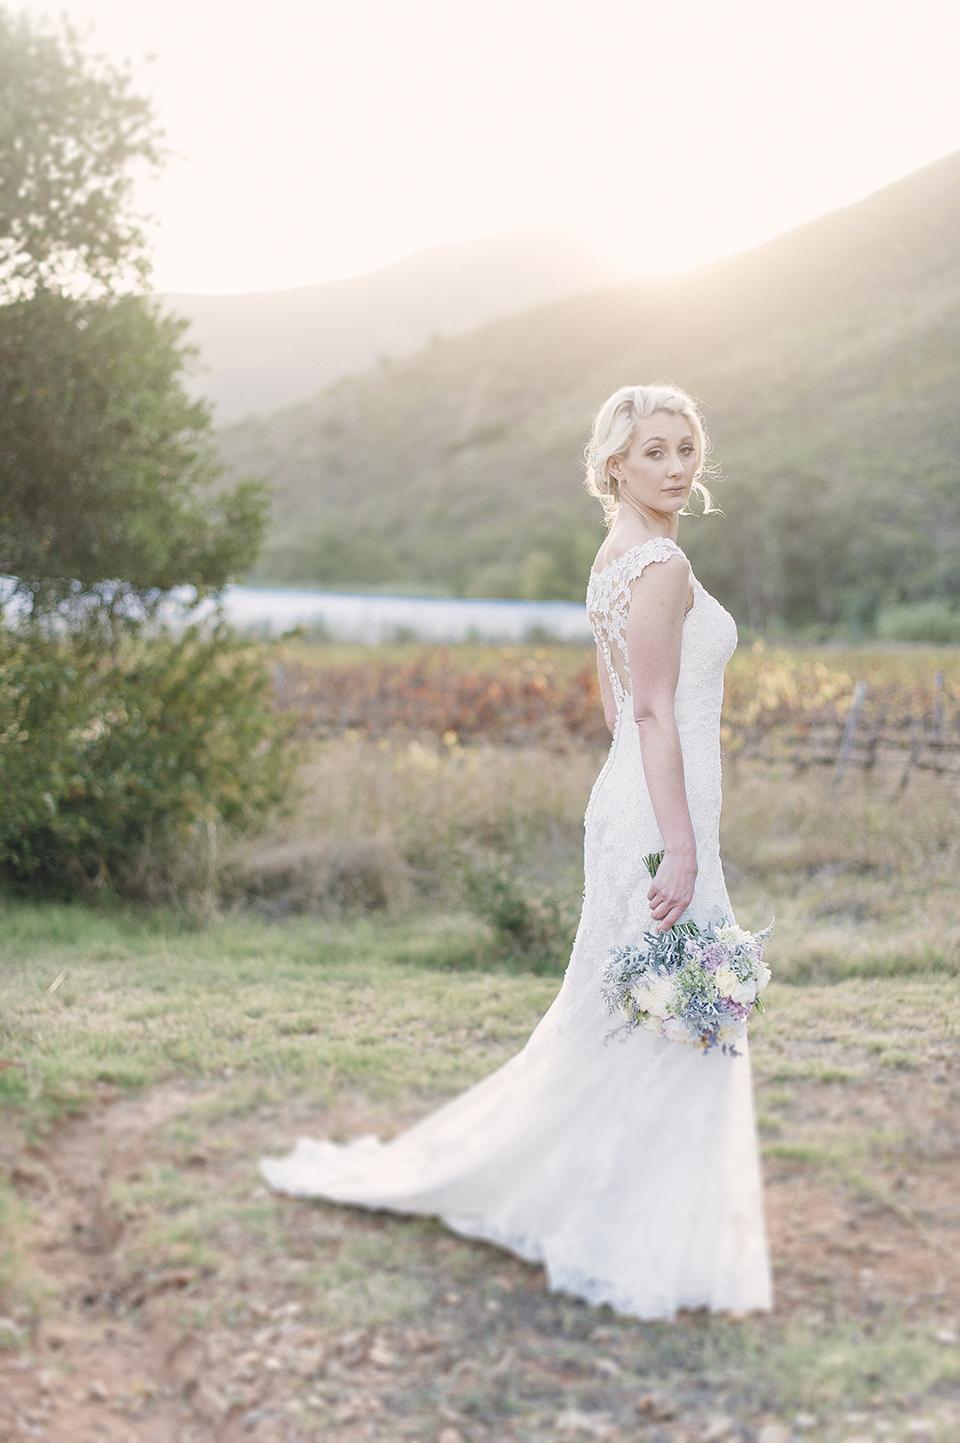 RyanParker_WeddingPhotographer_FineArt_CapeTown_Robertson_PatBusch_Hermanus_M&S_DSC_3488.jpg